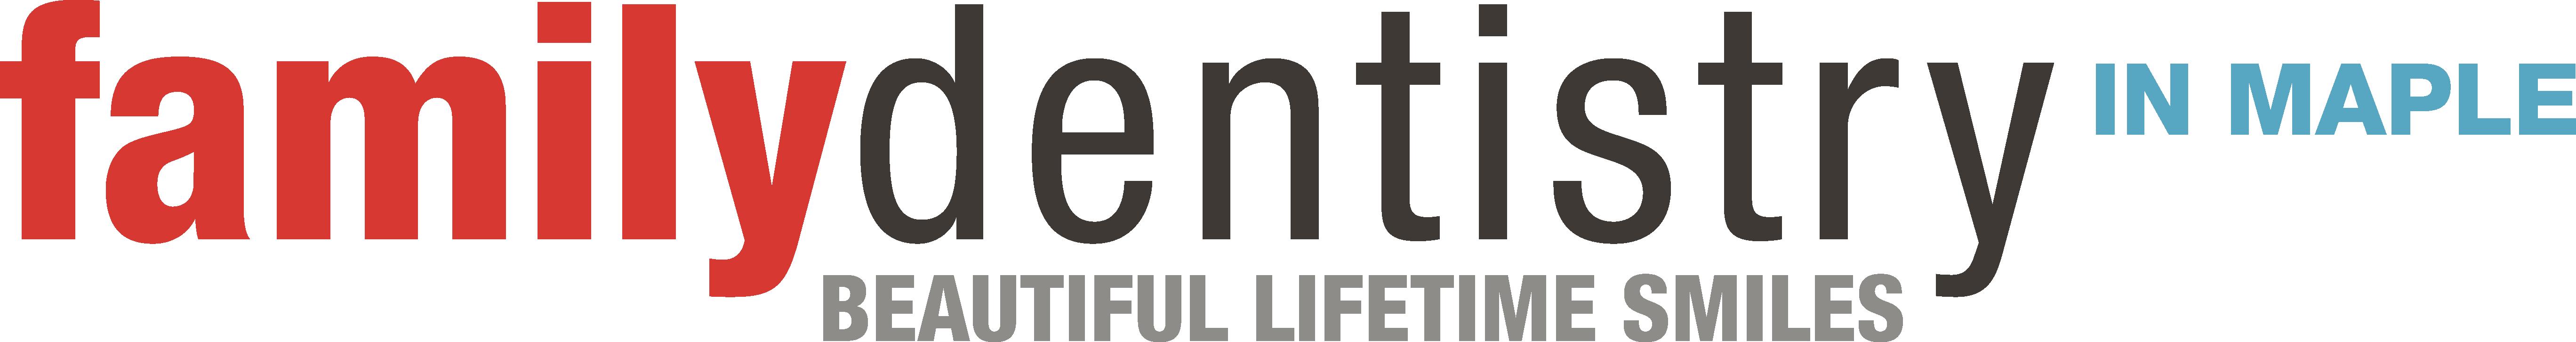 familydentistry_logo-01